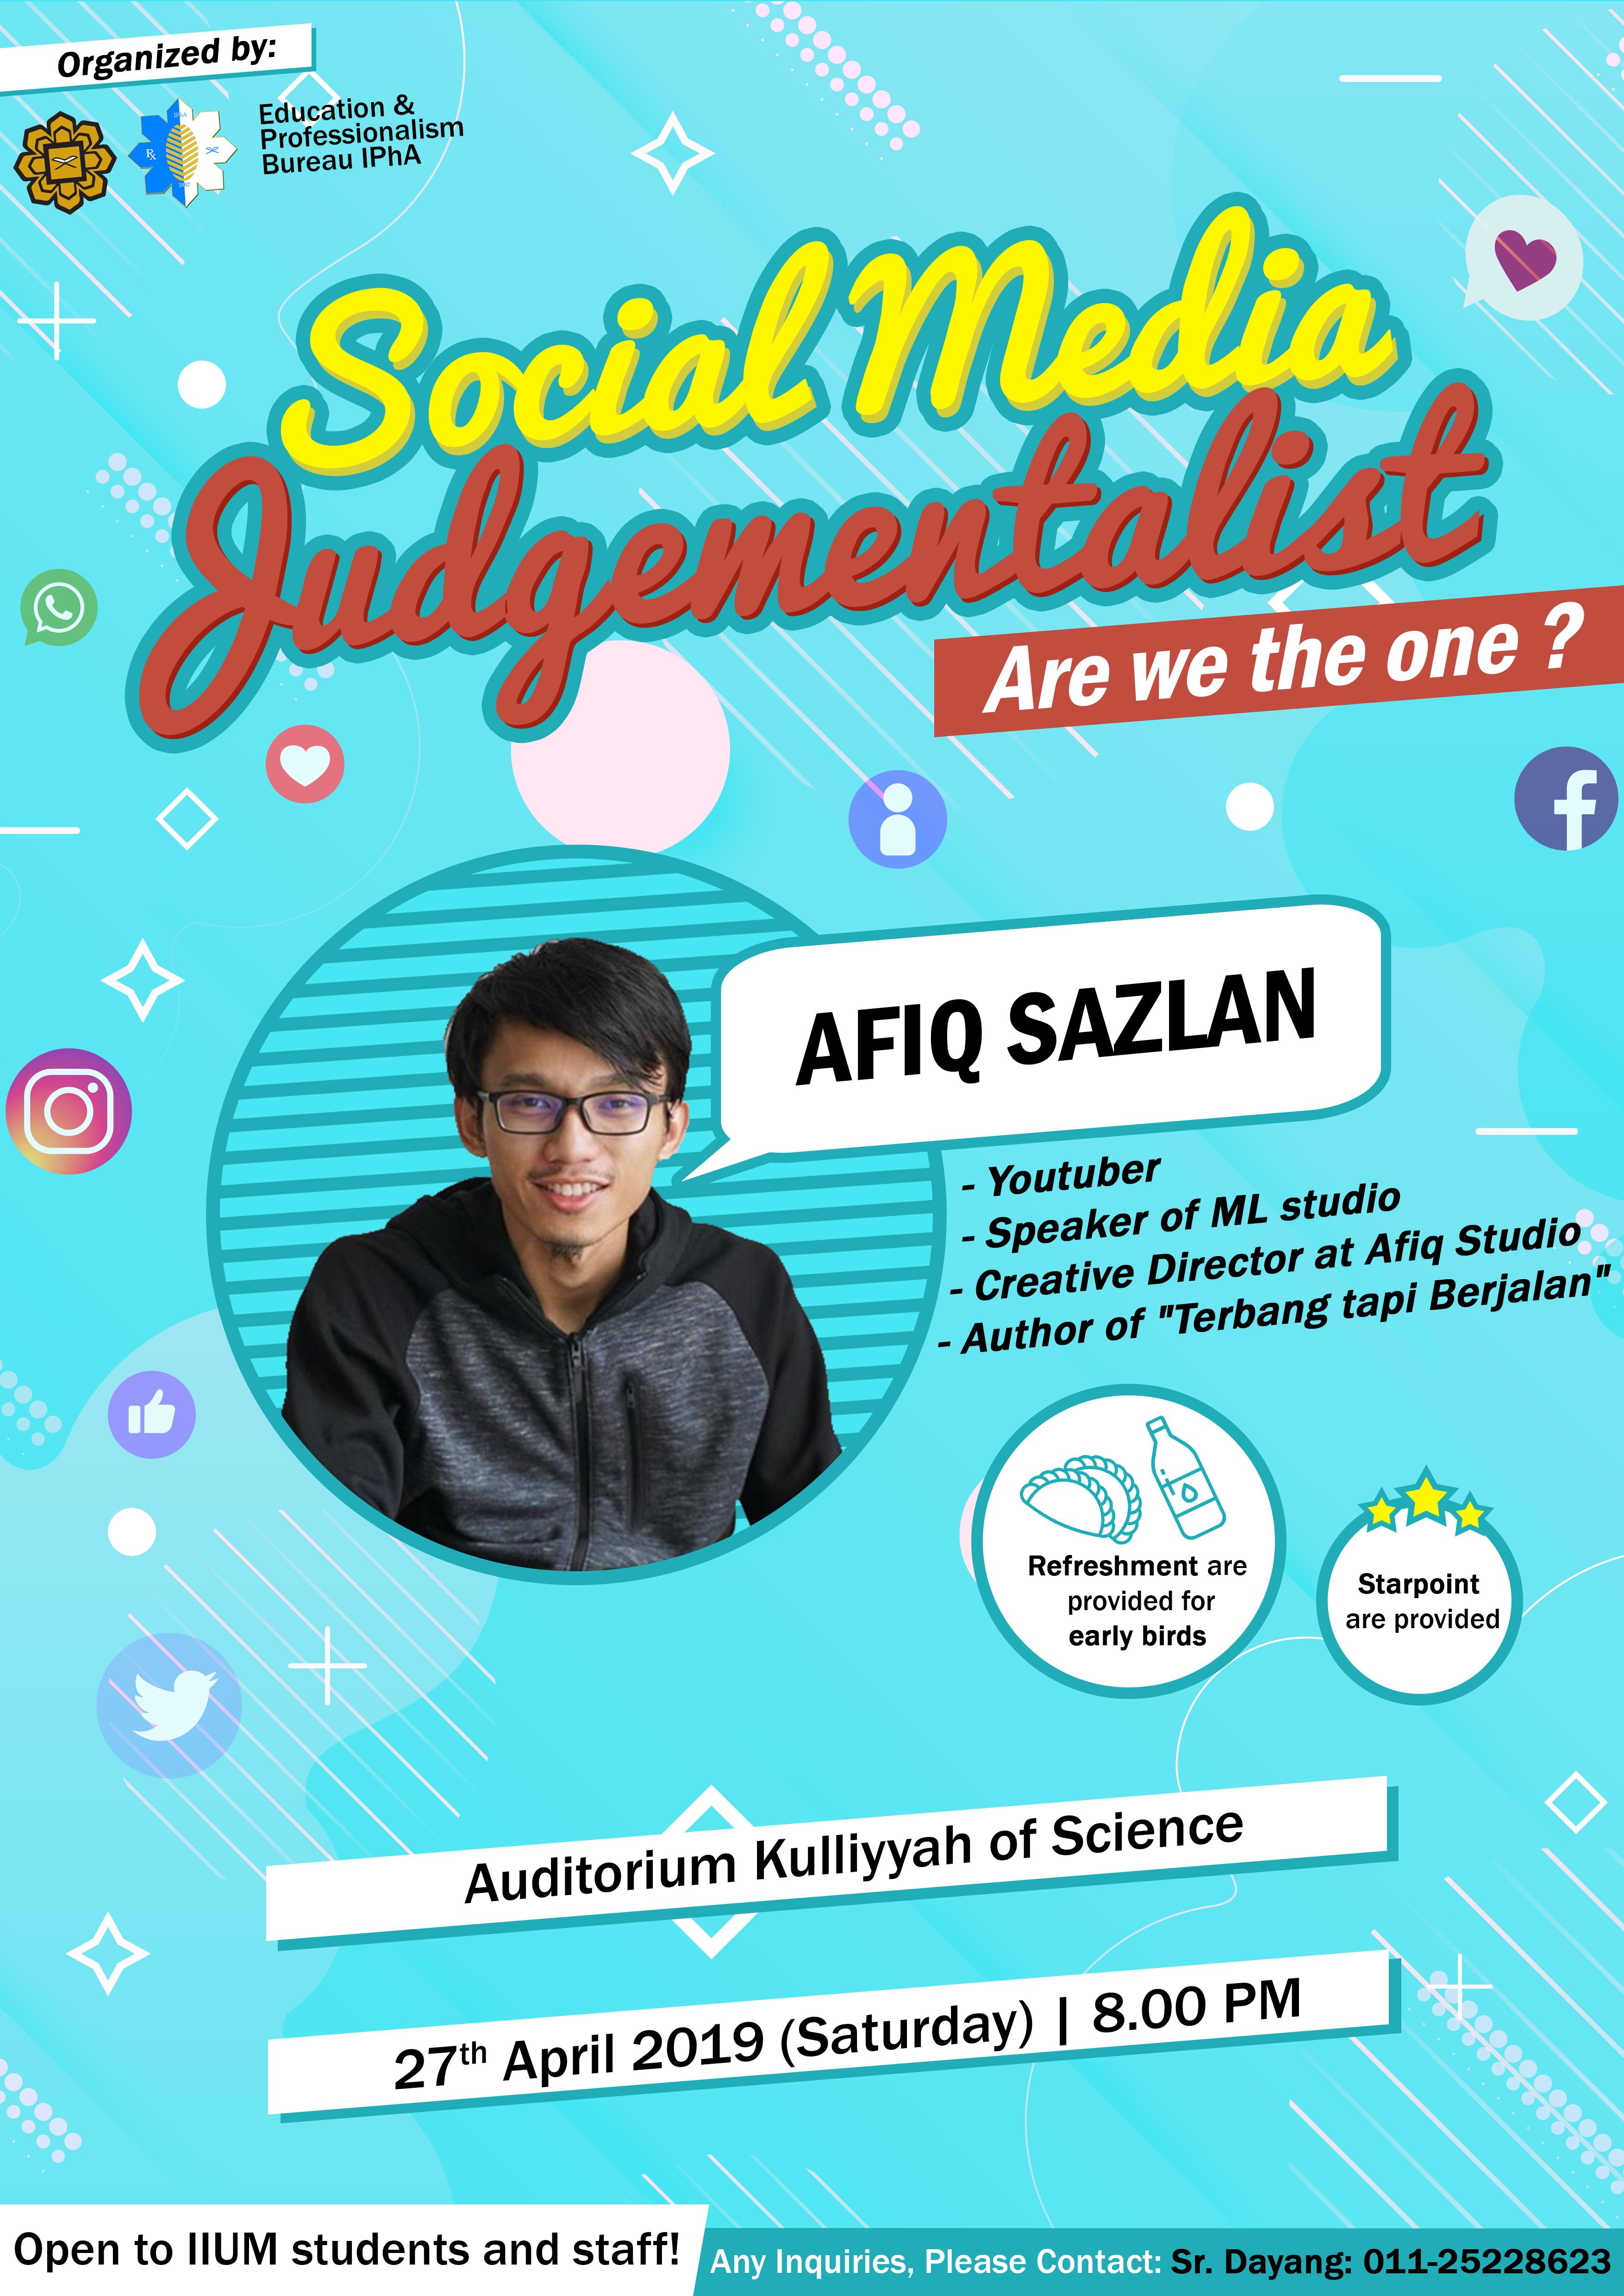 Social Media Judgementalist Talk 2019